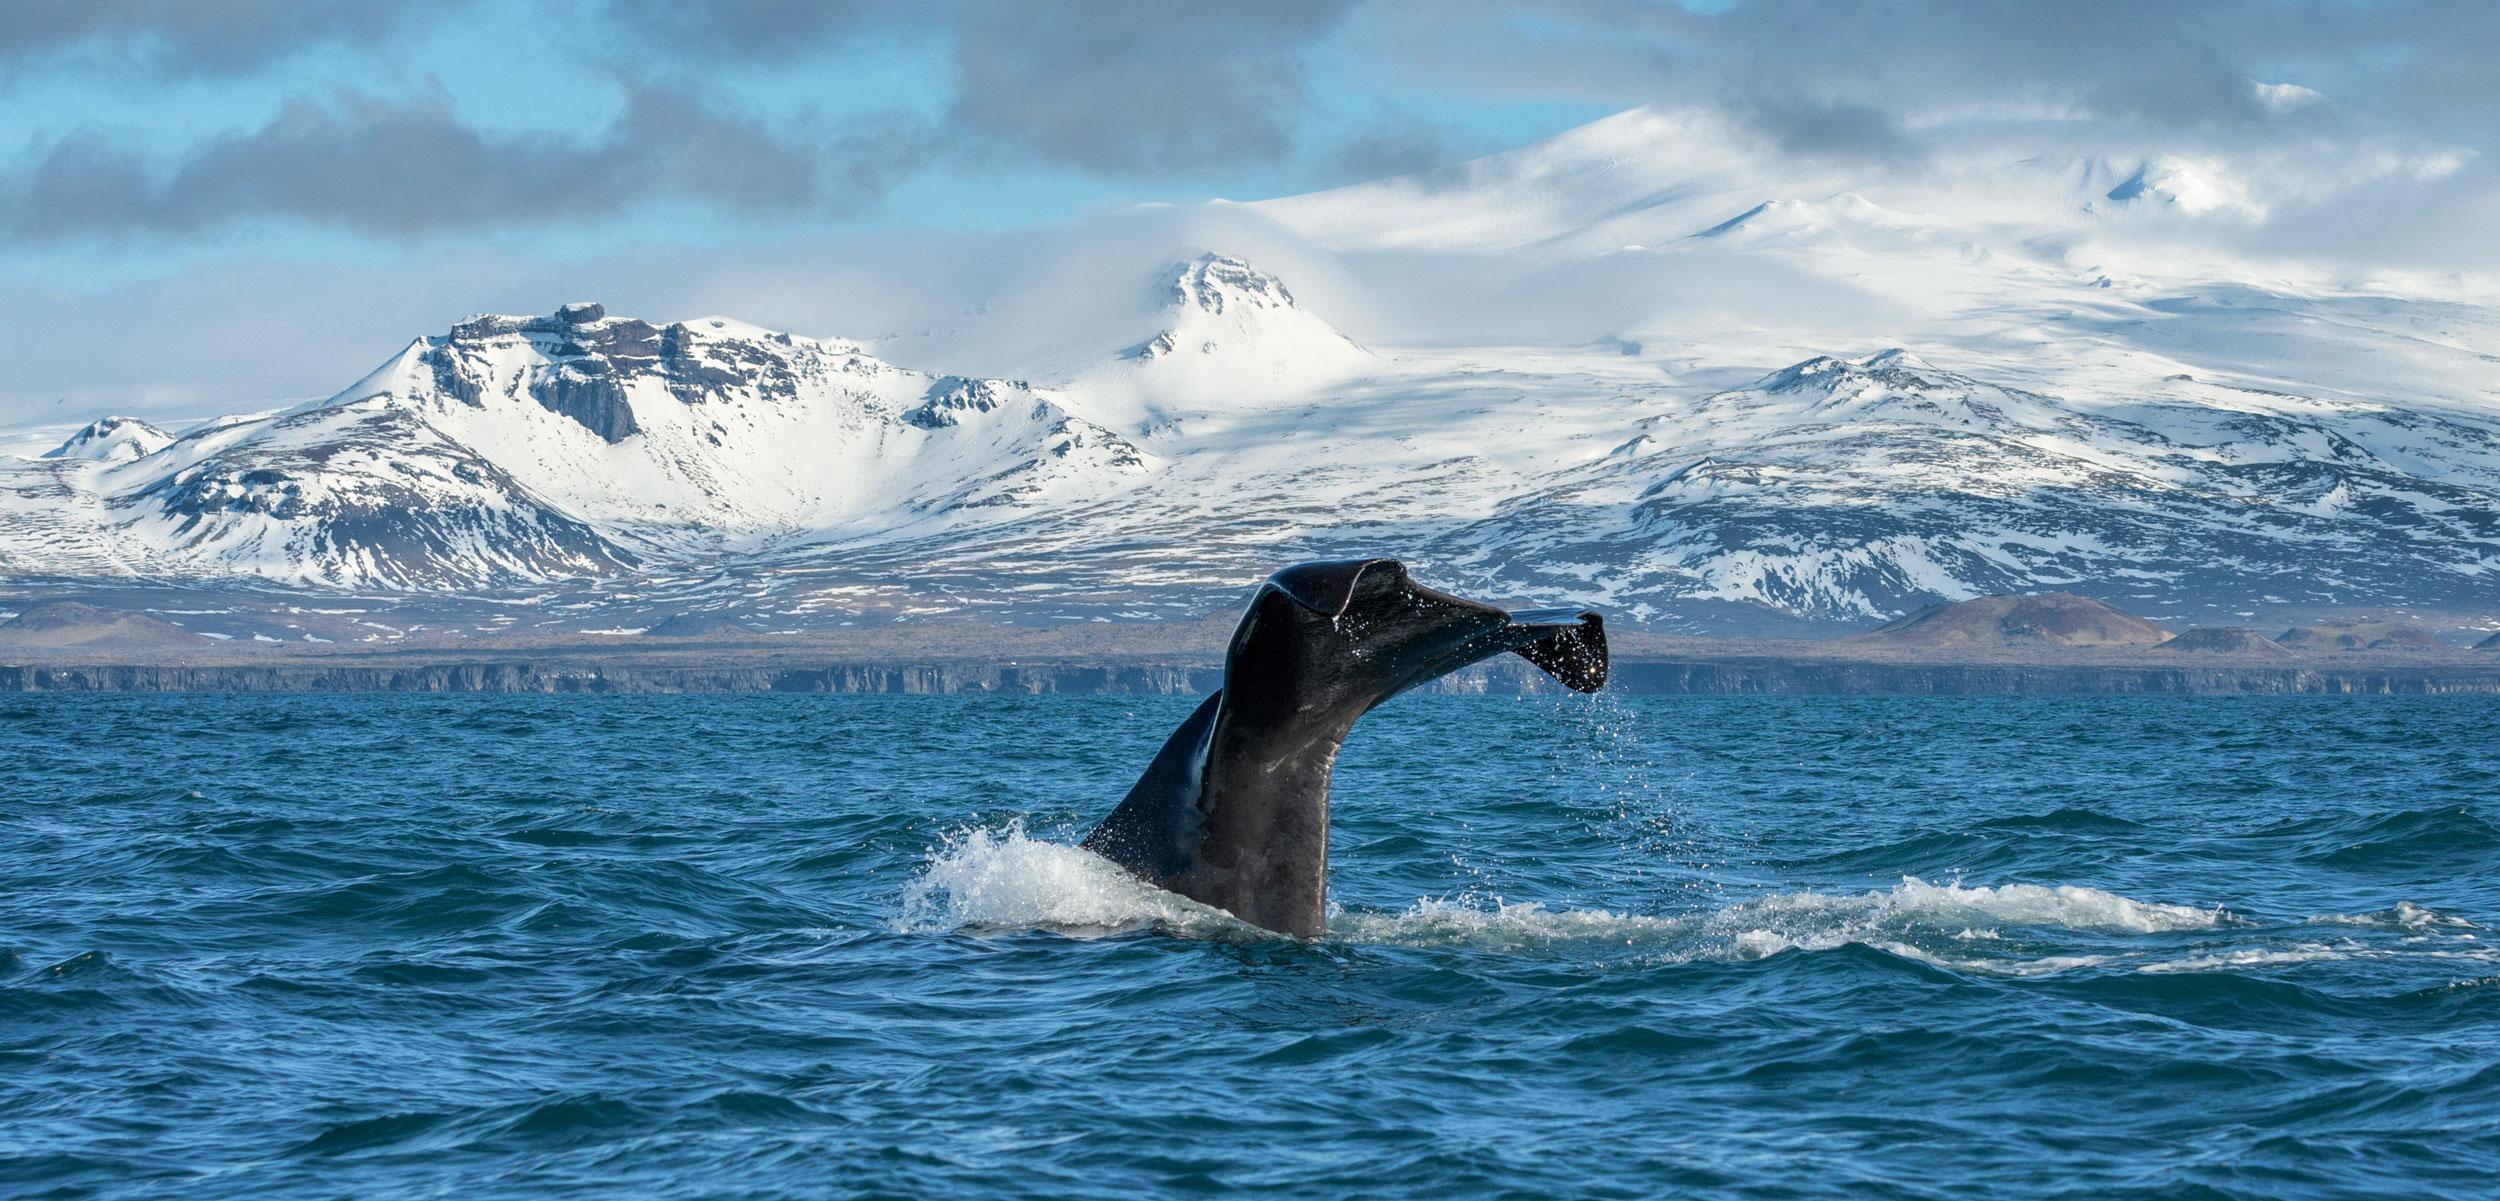 sperm whale tail, Iceland